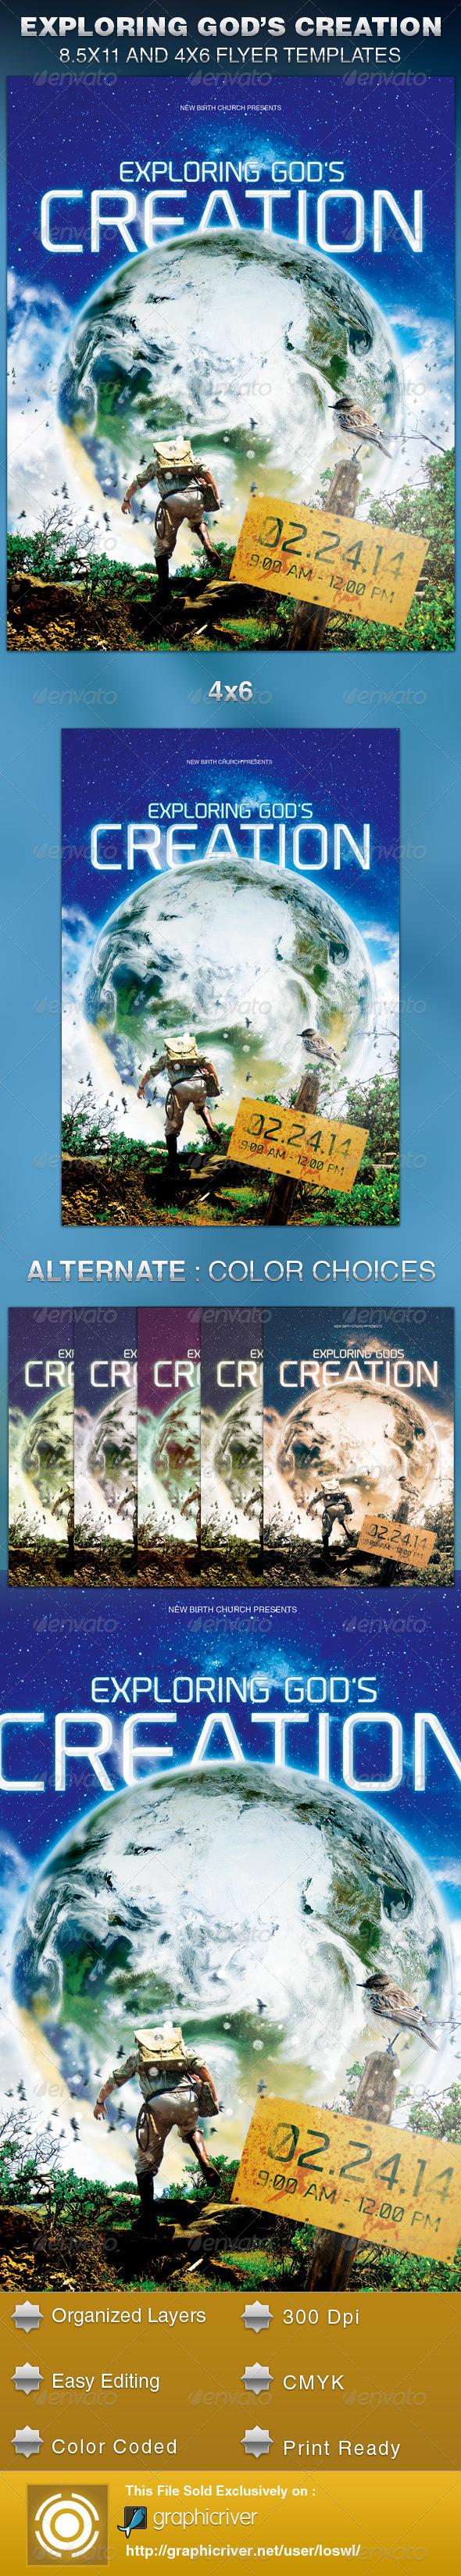 Exploring God's Creation Church Flyer Template - Church Flyers